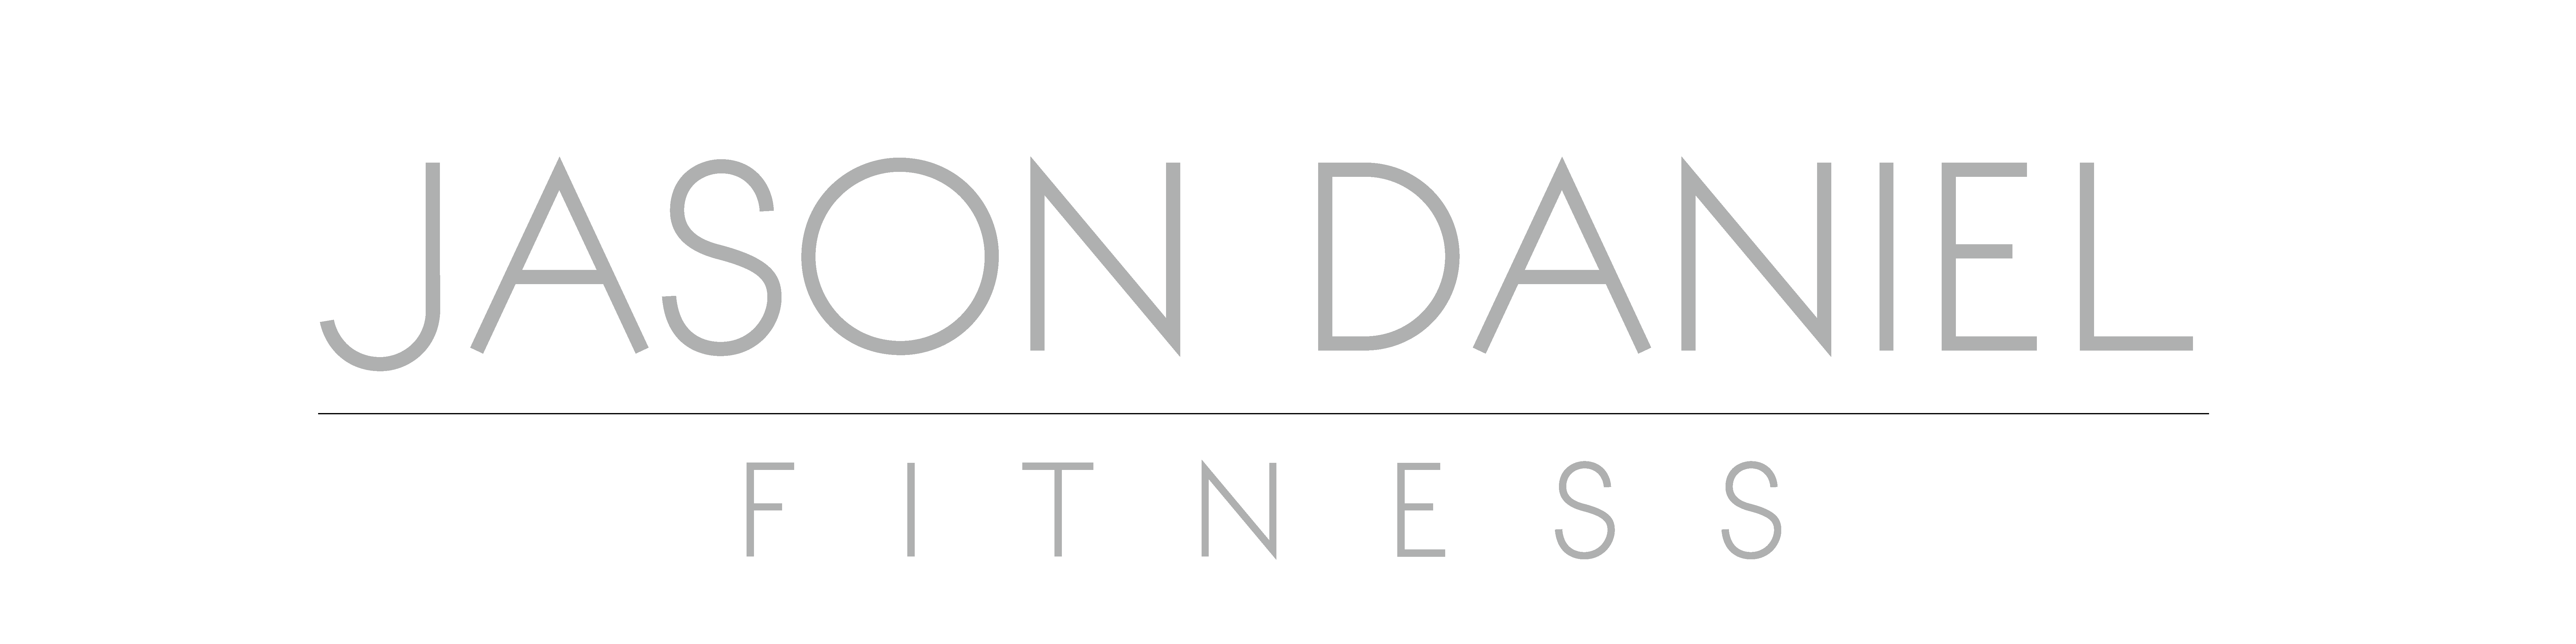 Jason Daniel Fitness